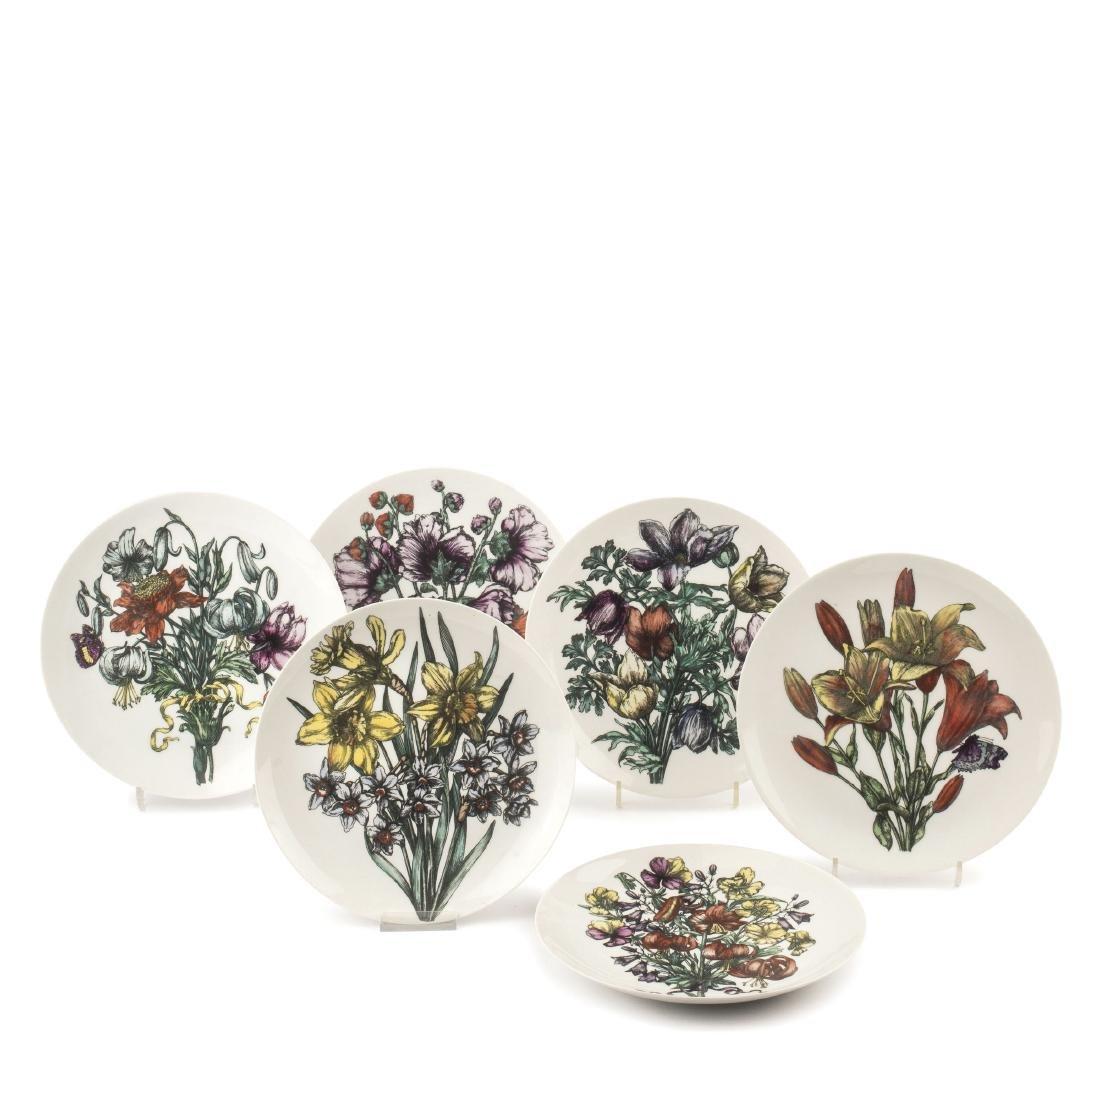 Six 'Fiori' plates, 1960s